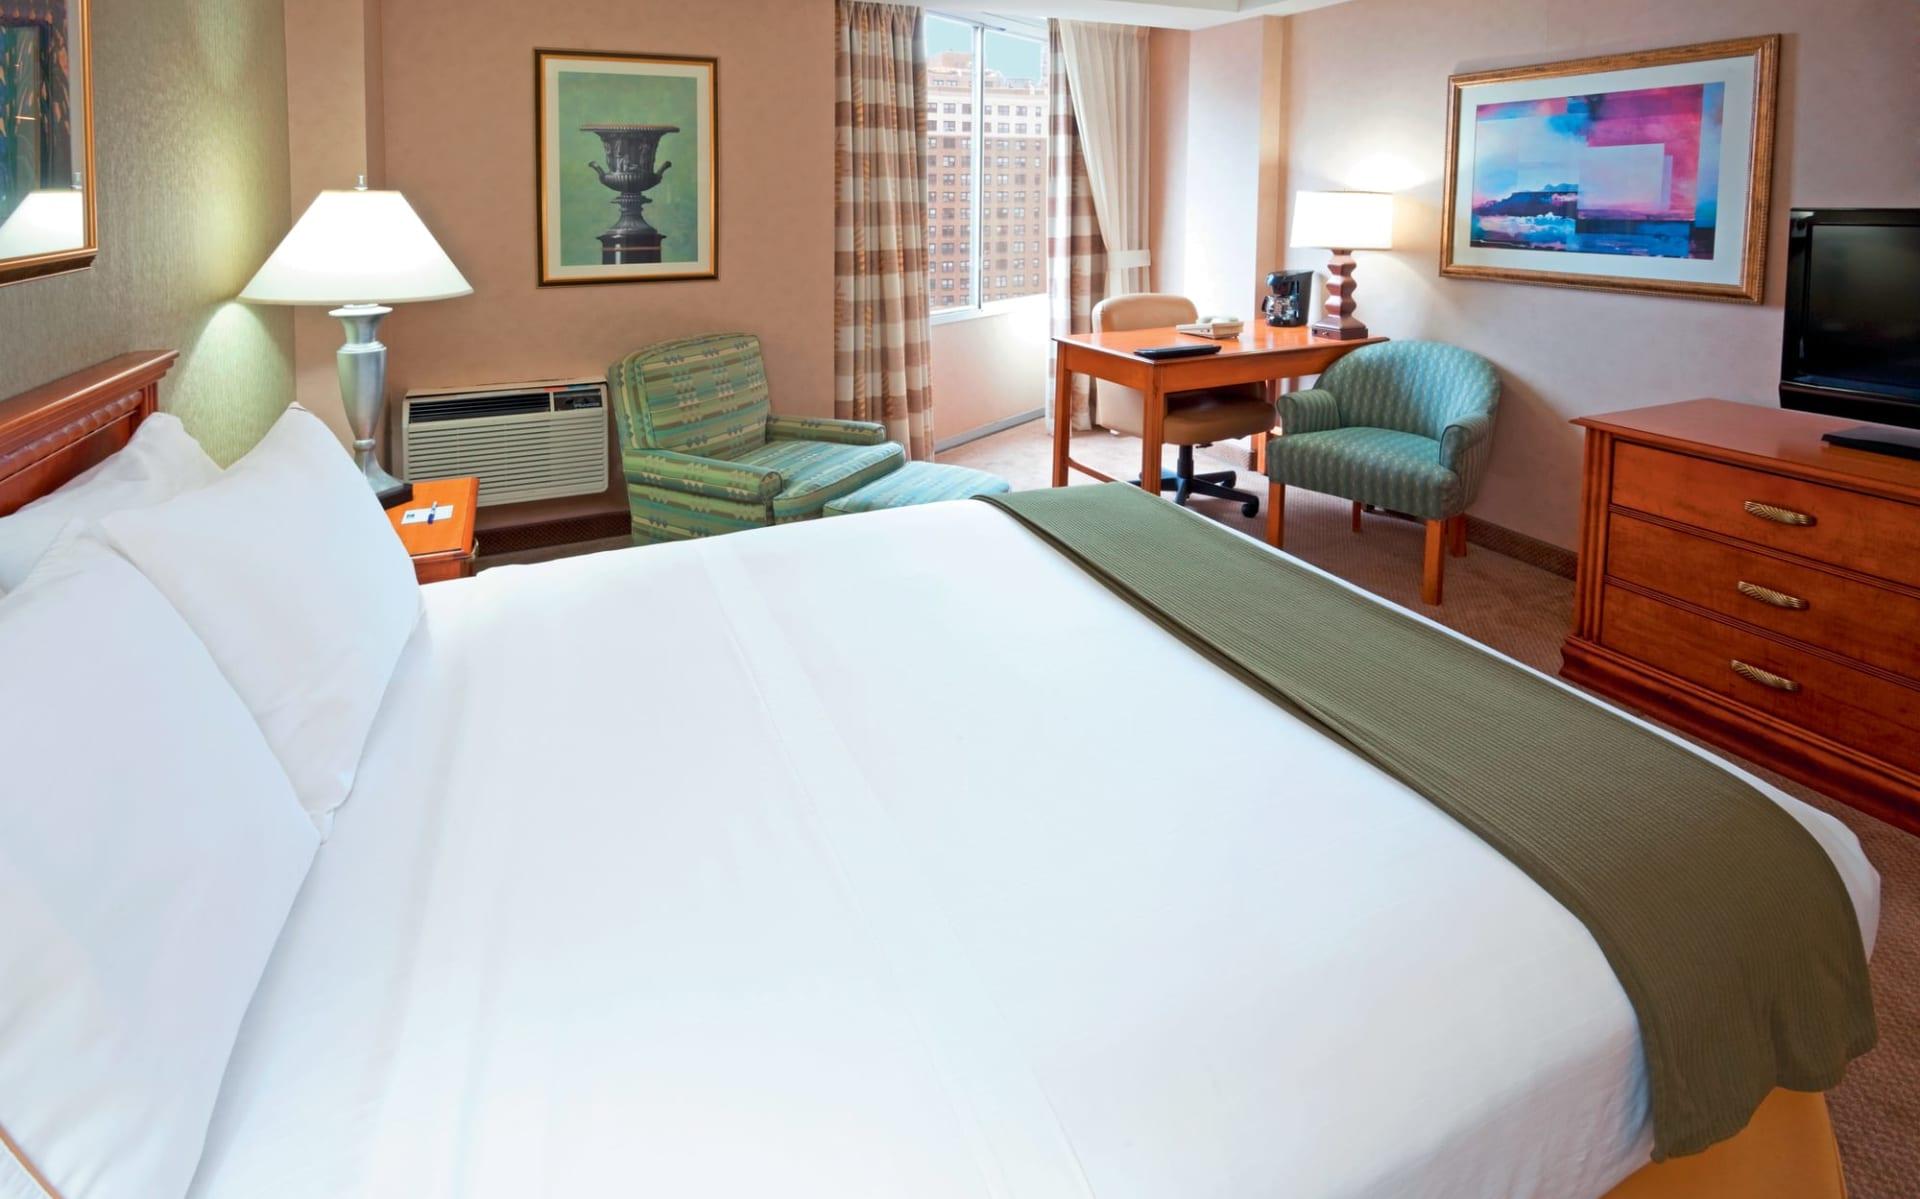 Holiday Inn Express Midtown in Philadelphia: zimmer holiday inn express midtown doppelzimmer